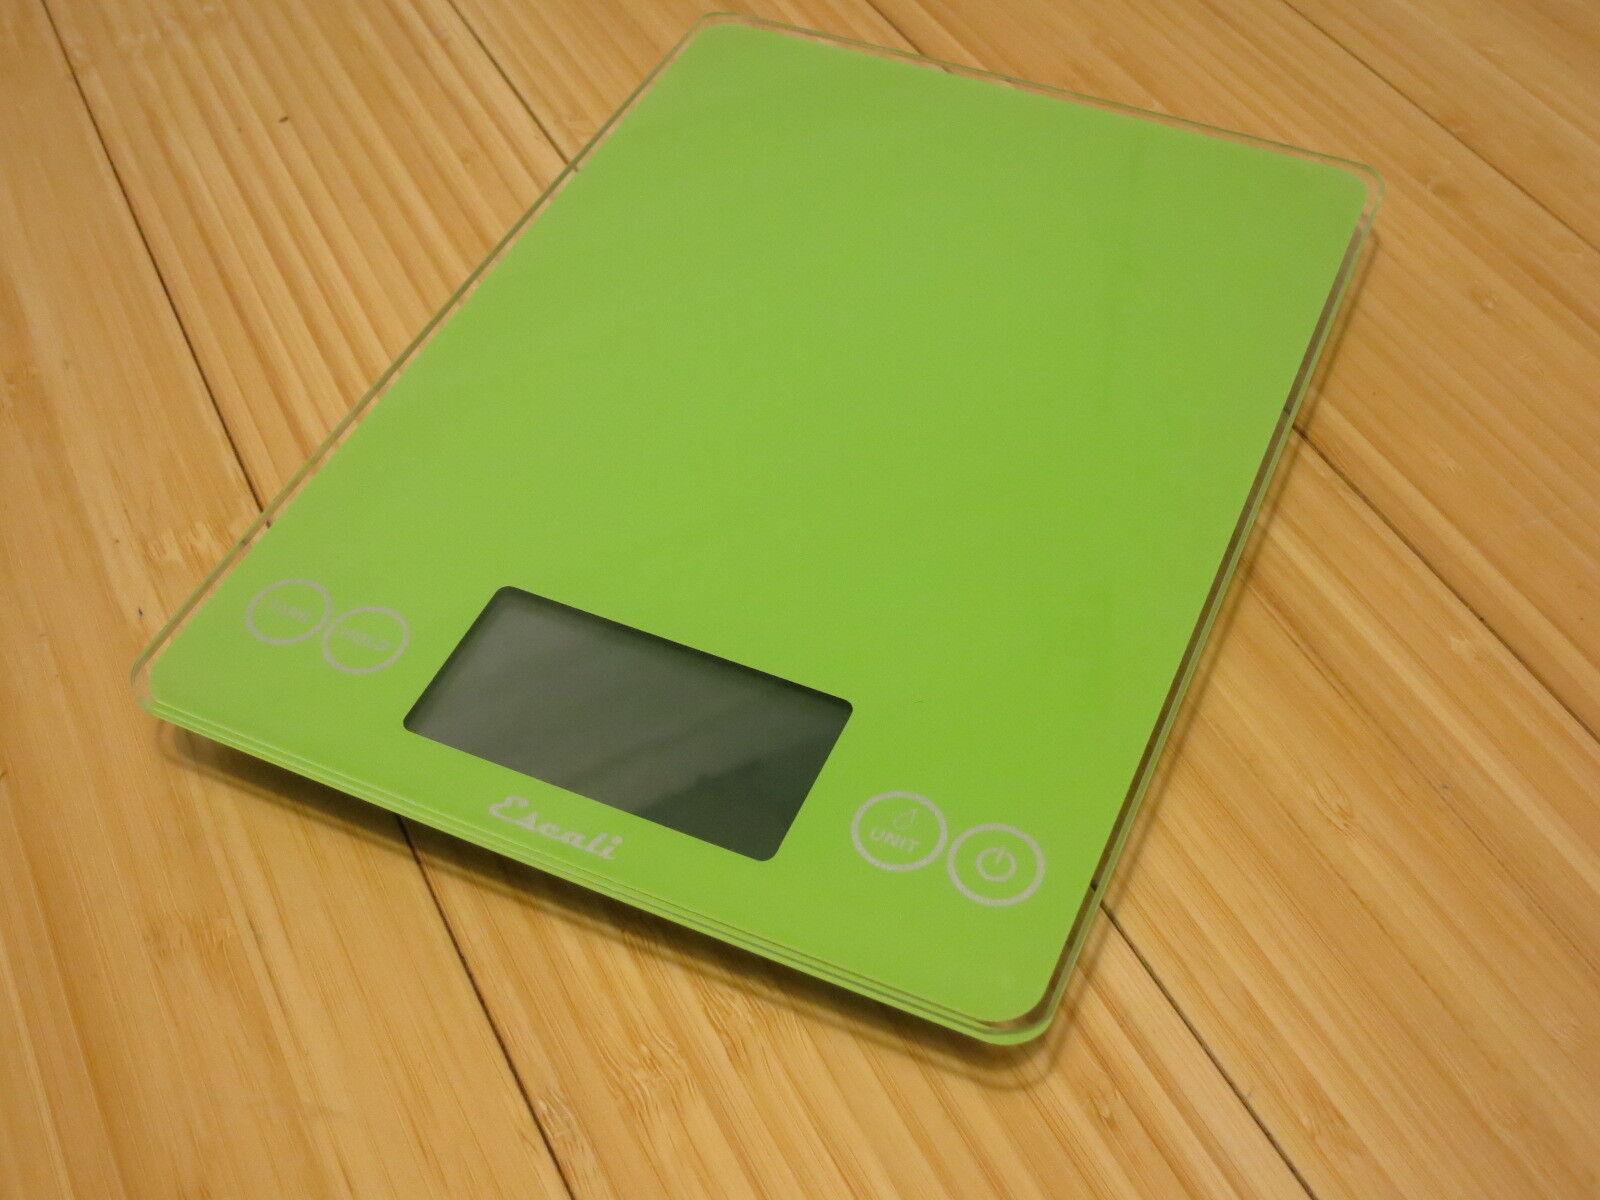 Escali Arti Liquid/Dry Weighing Multifunctional Scale 157LG Green 15 Lbs/7 Kg